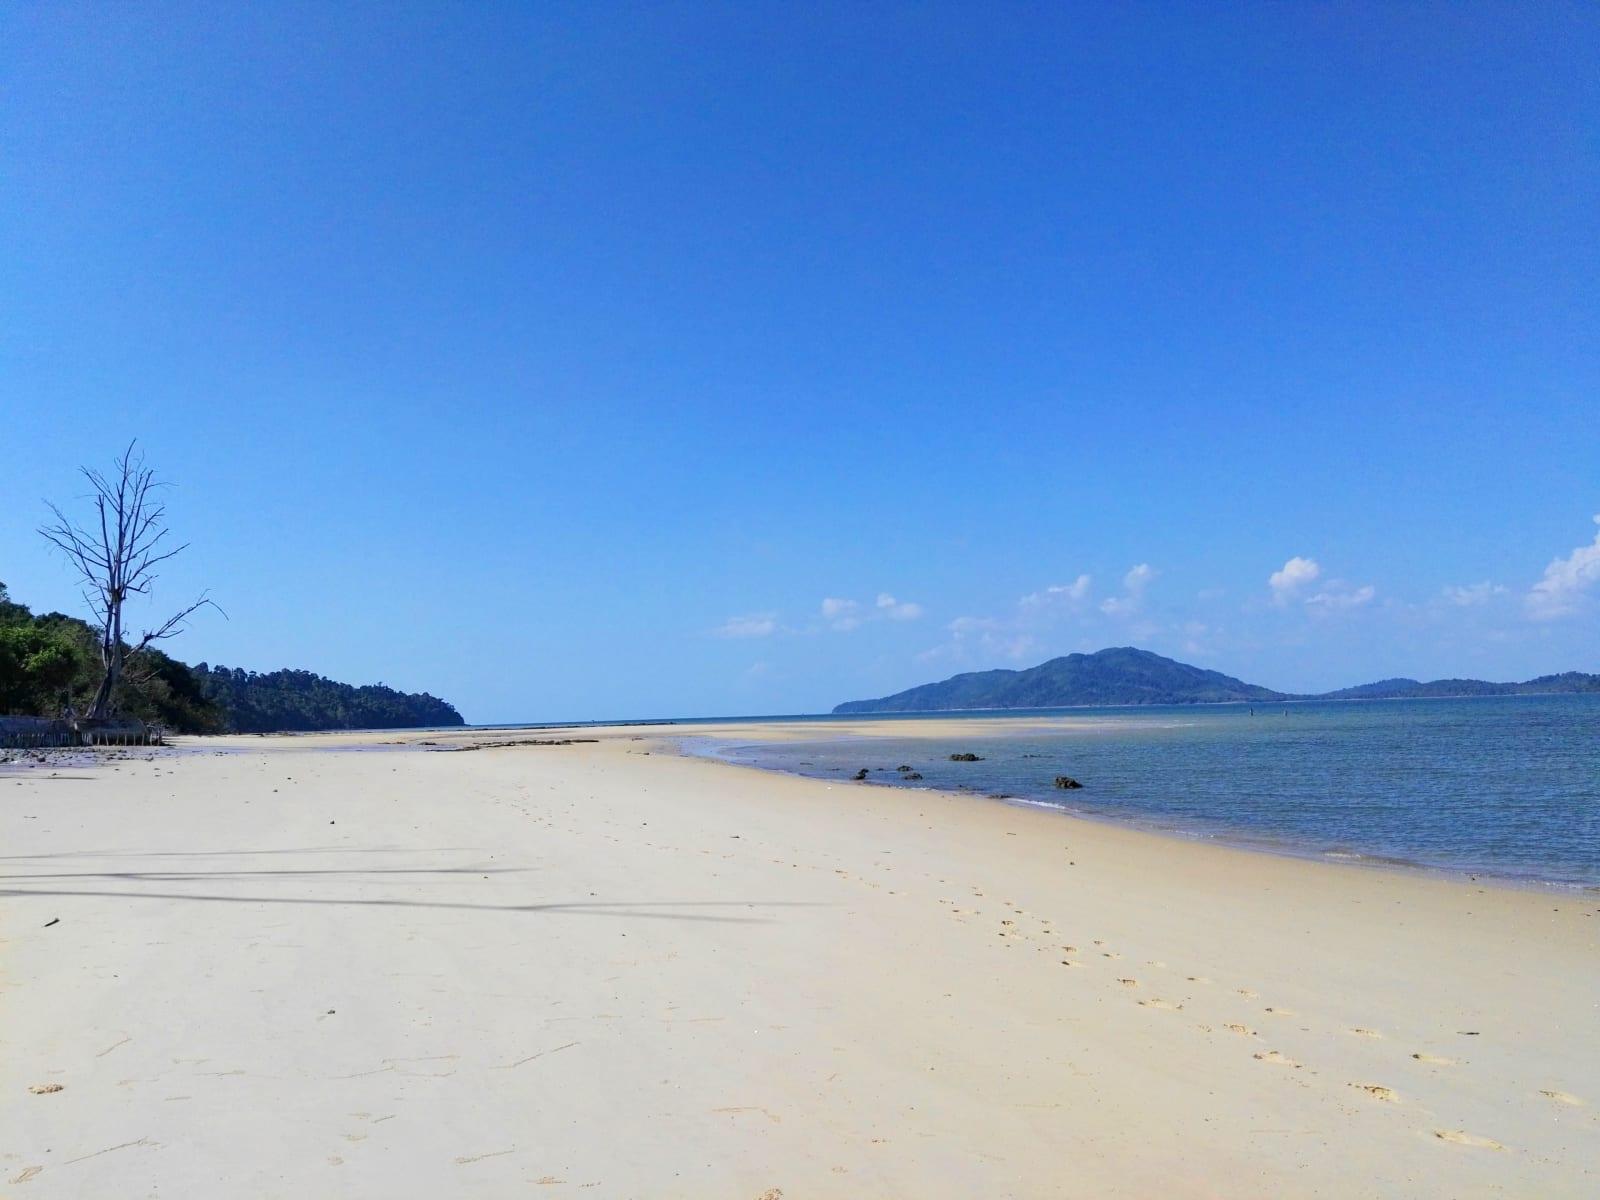 Osamělá pláž u PP Land, Koh Phayam, Thajsko